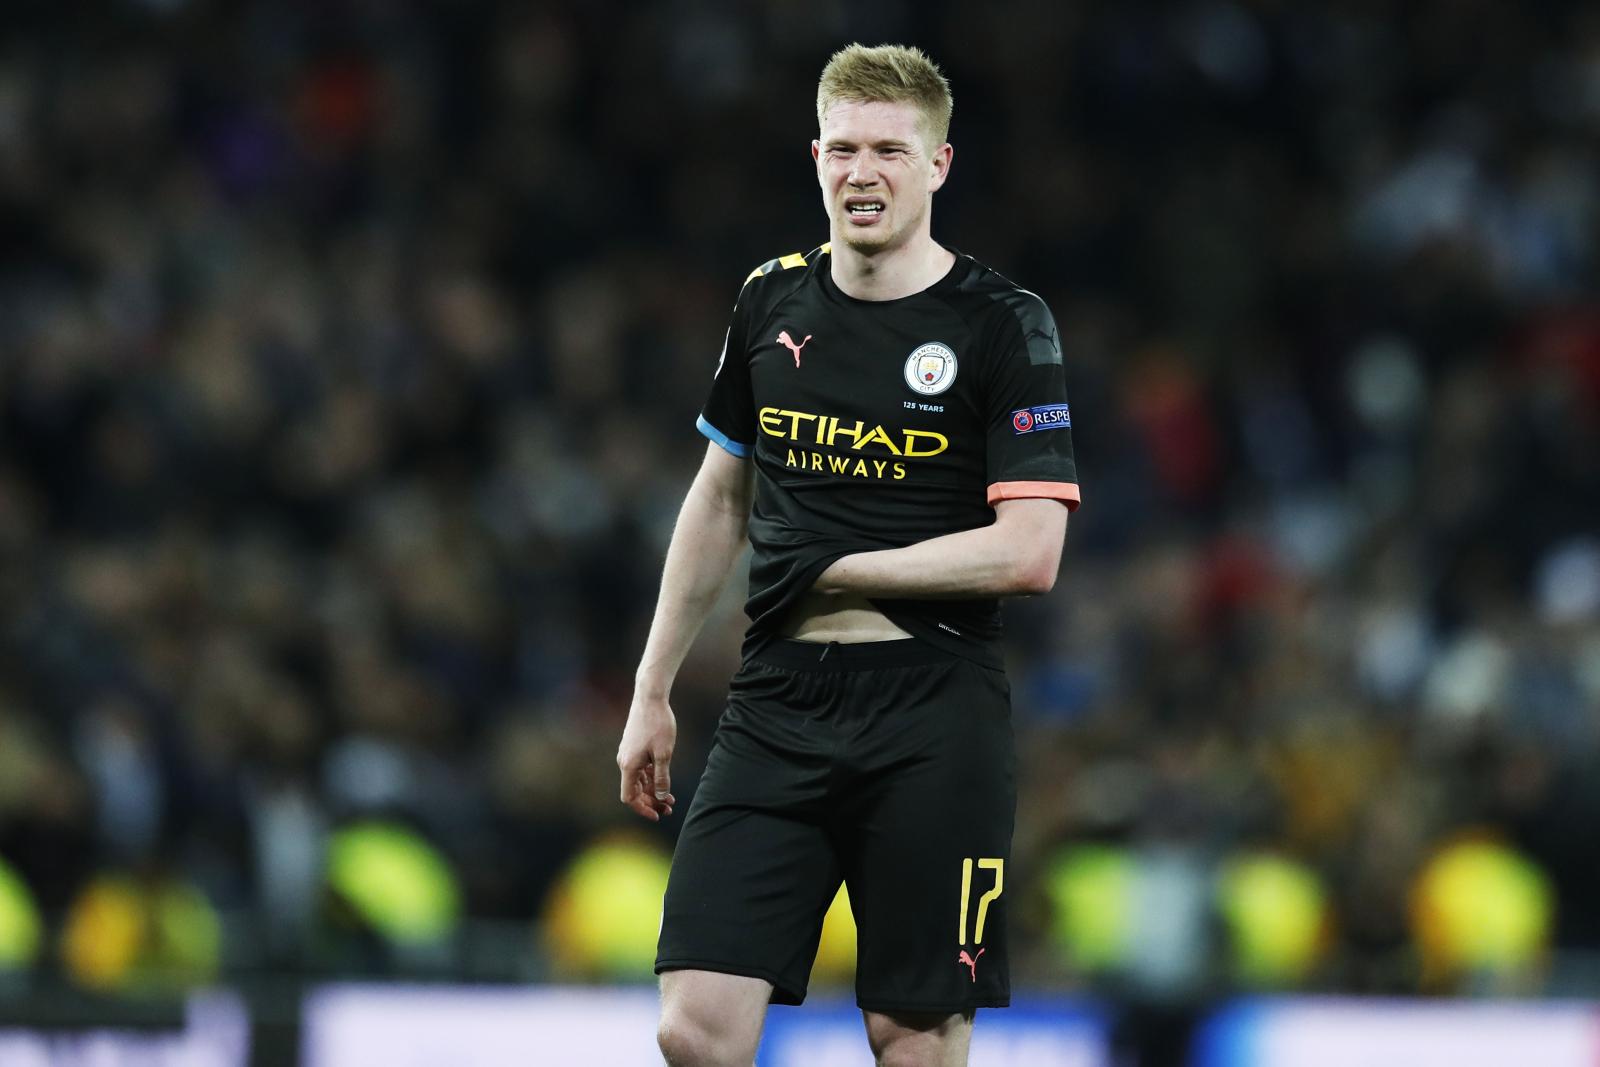 Манчестер Сити — Ньюкасл: прогноз на матч 34-го тура чемпионата Англии